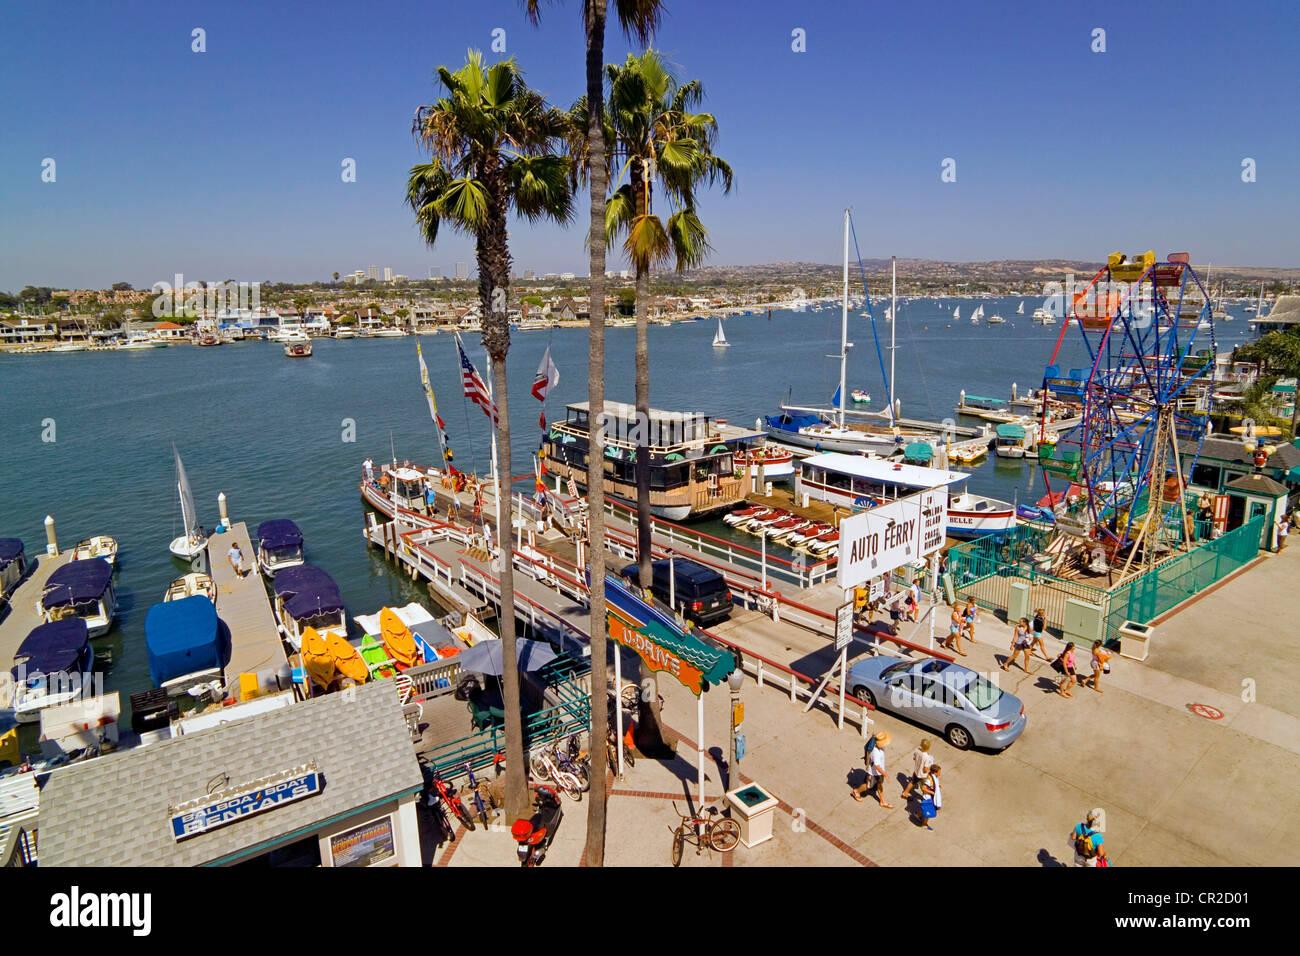 Vintage three-car ferryboats cross Newport Harbor between the Fun Zone on the Balboa Peninsula and Balboa Island - Stock Image